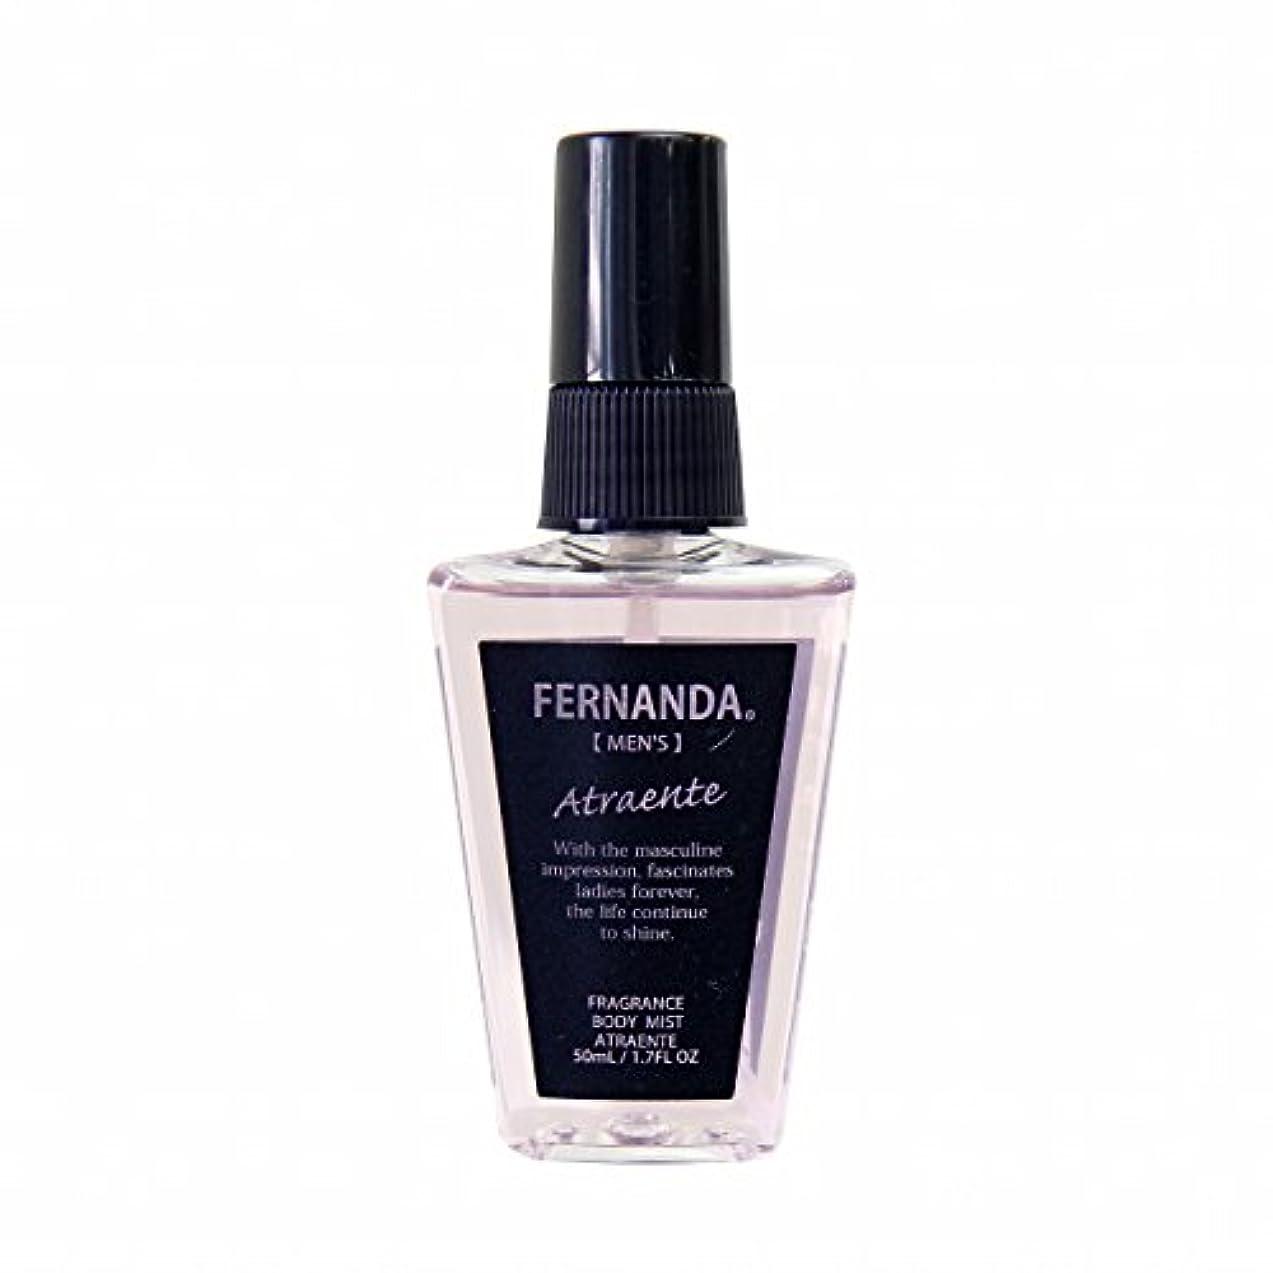 FERNANDA(フェルナンダ) Body Mist For MEN Atrante (ボディミスト フォーメン アトランテ)